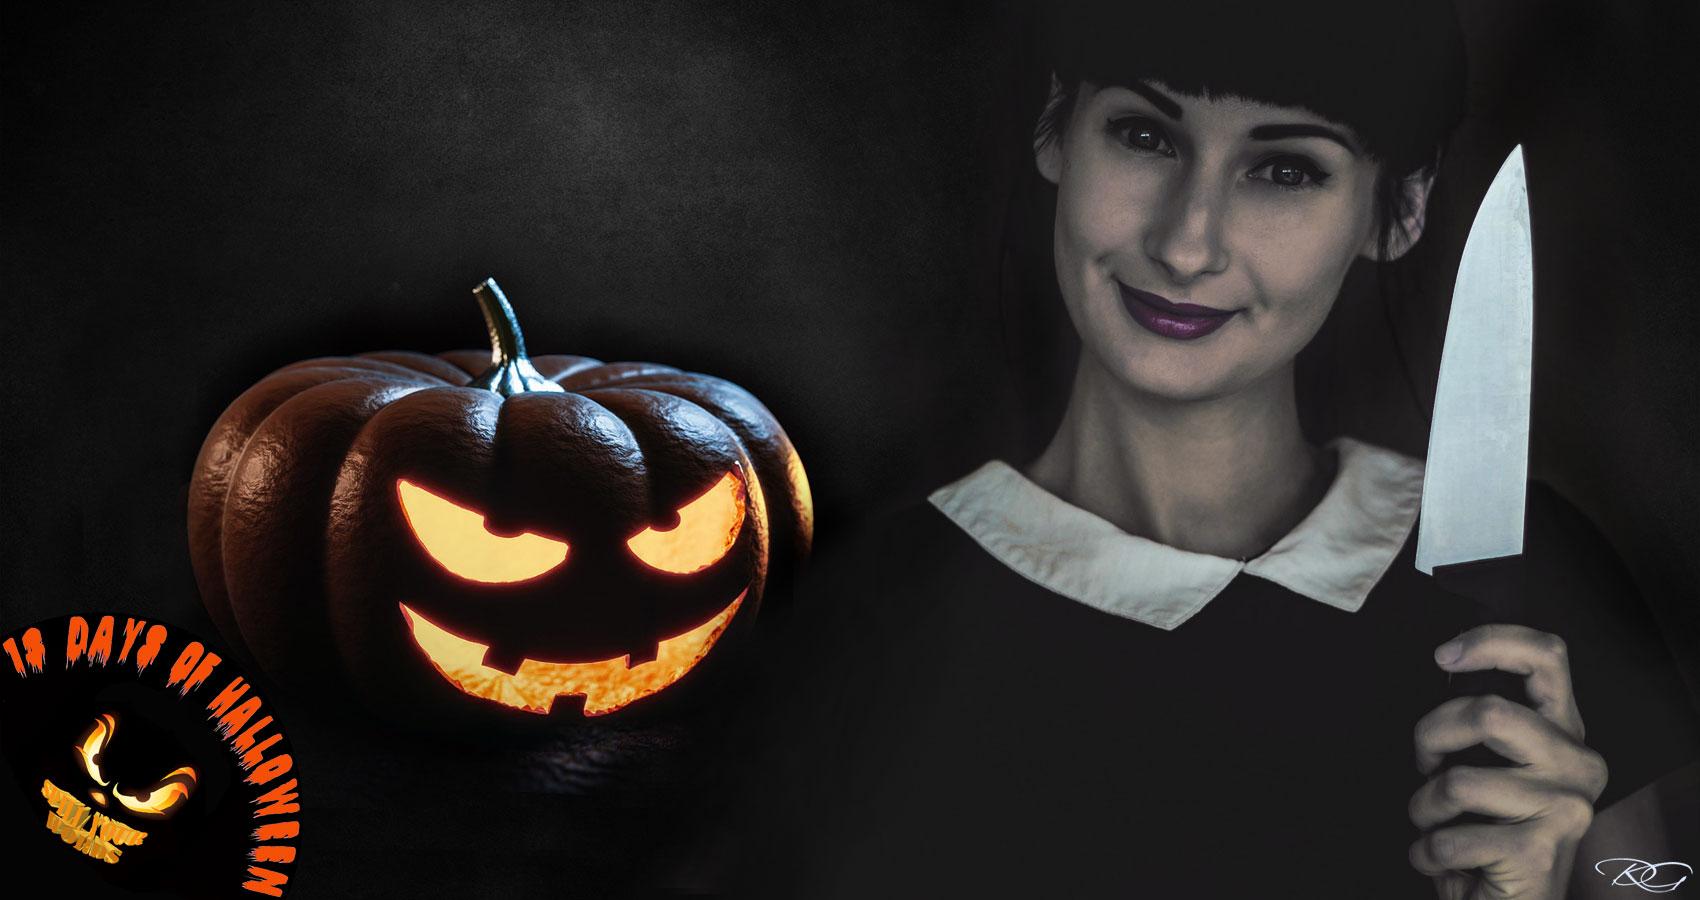 Pumpkin Guts, written by Rando Mithlo at Spillwords.com